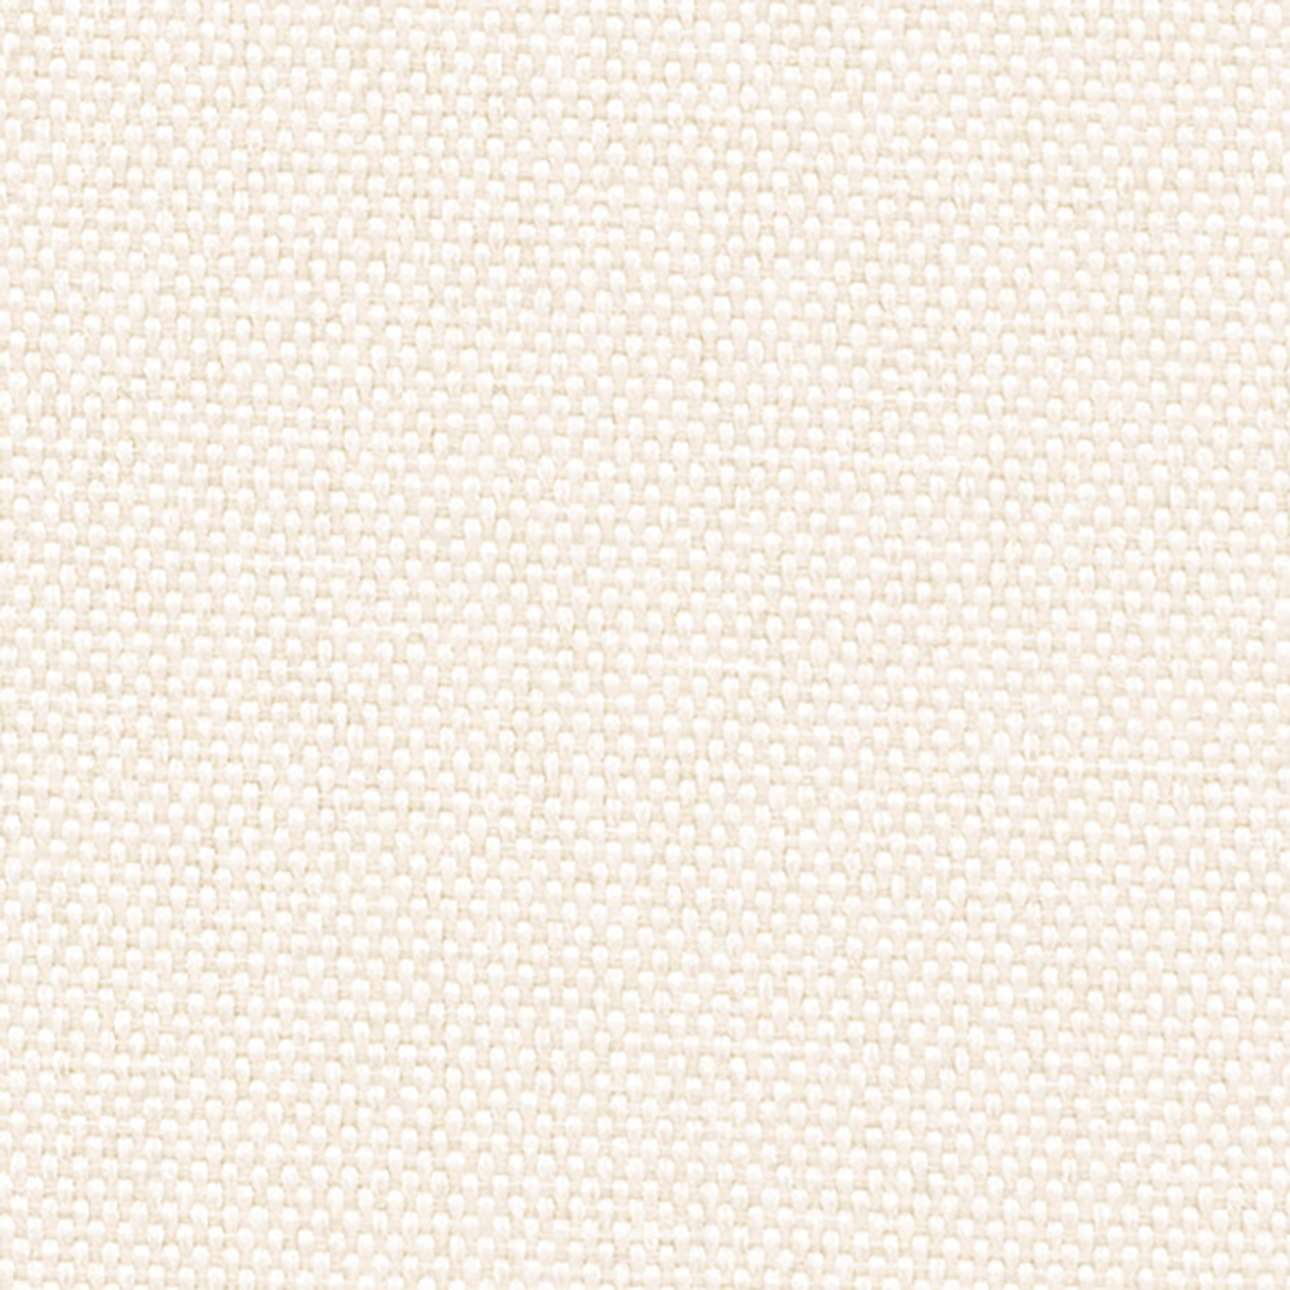 Ikea PS Sesselbezug von der Kollektion Etna, Stoff: 705-01